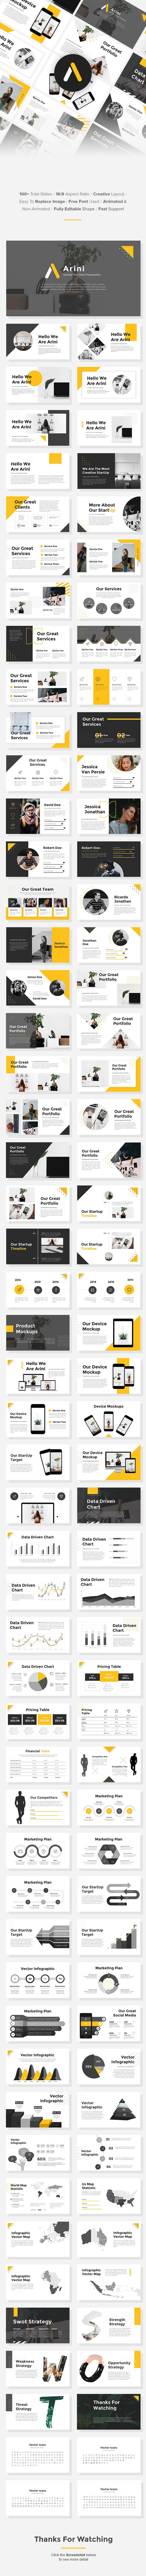 Arini - StartUp Pitch Deck Google Slides Template - Google Slides Presentation Templates